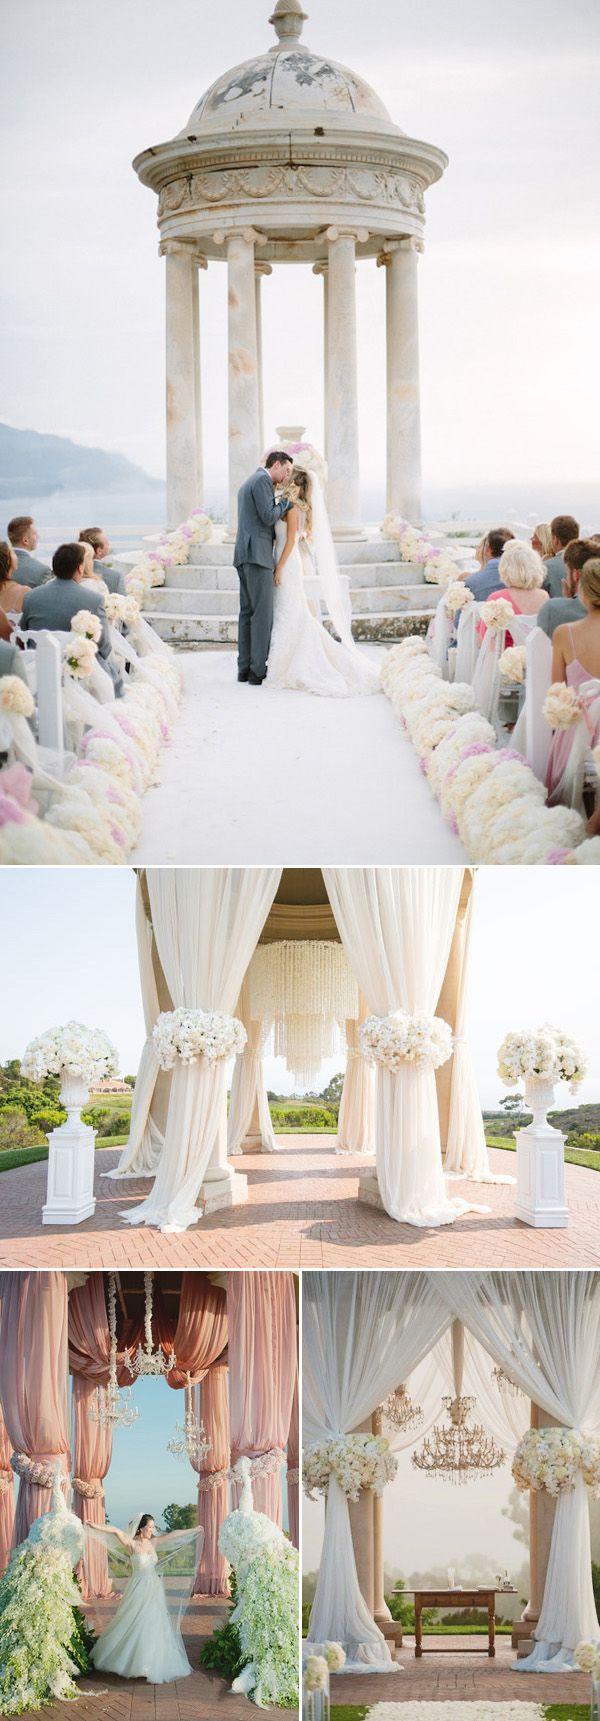 best wedding images on pinterest beach weddings boyfriends